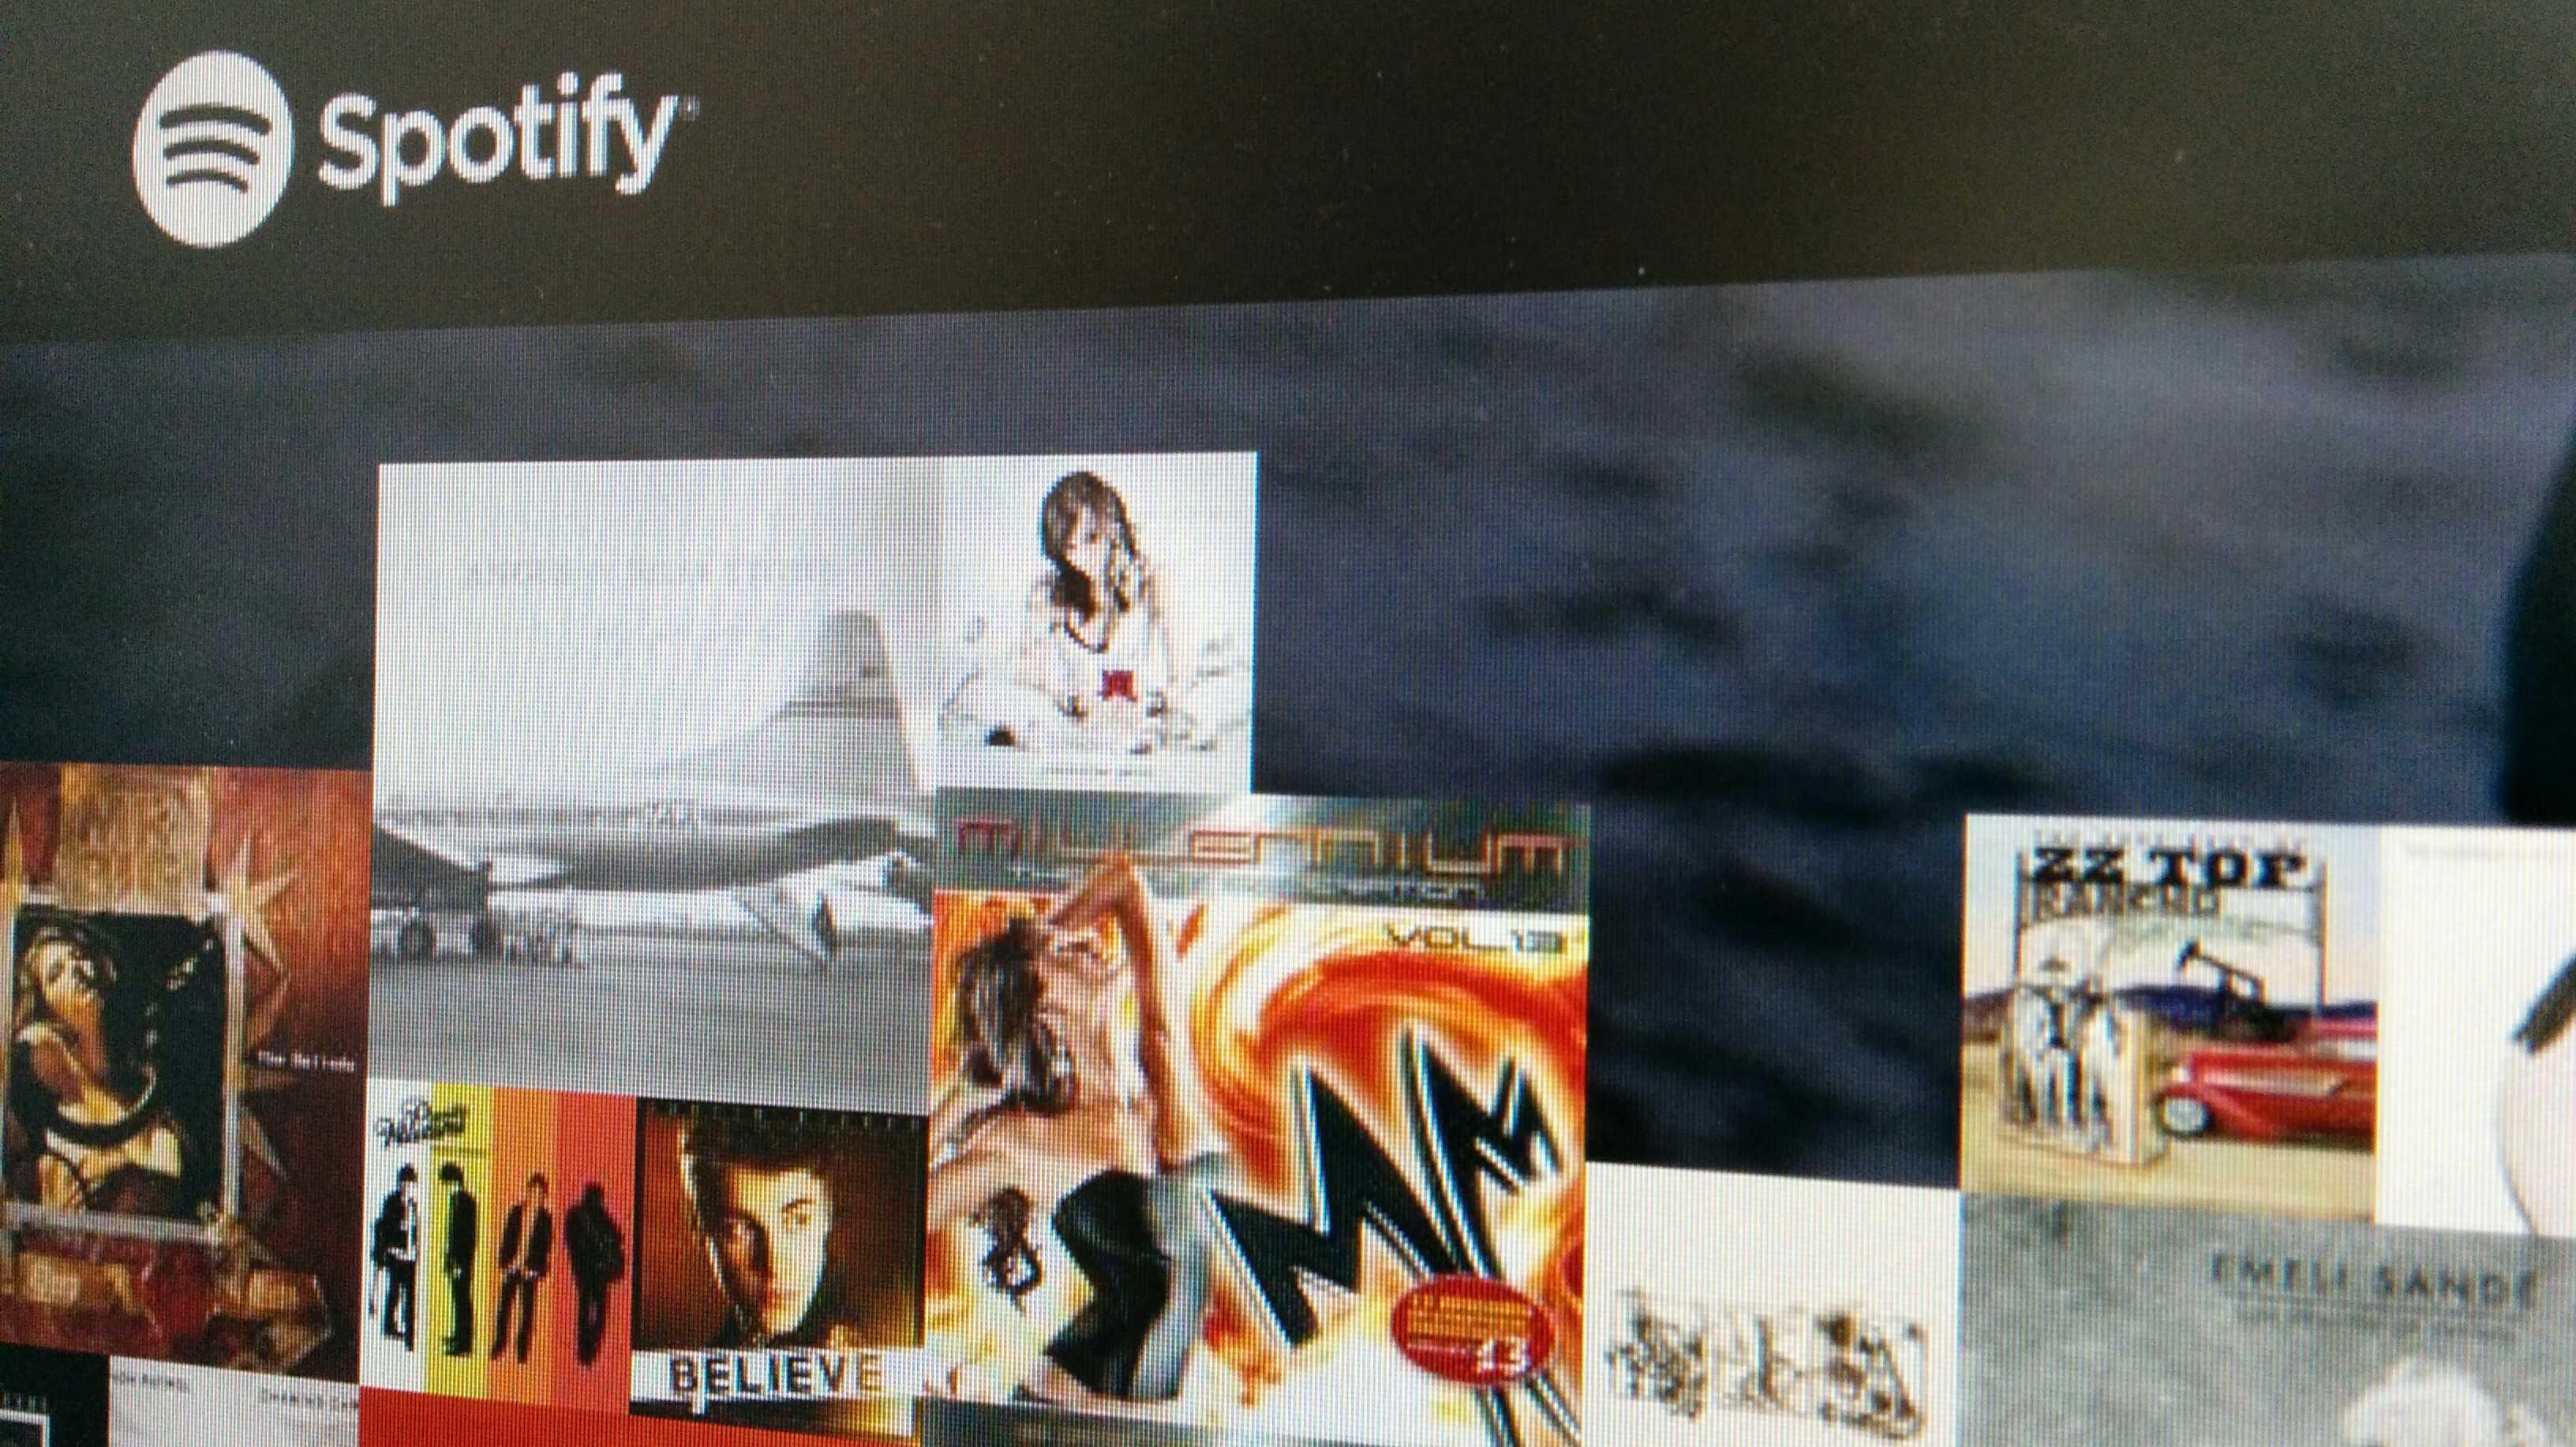 Universal Music will weniger Gratis-Musik bei Spotify